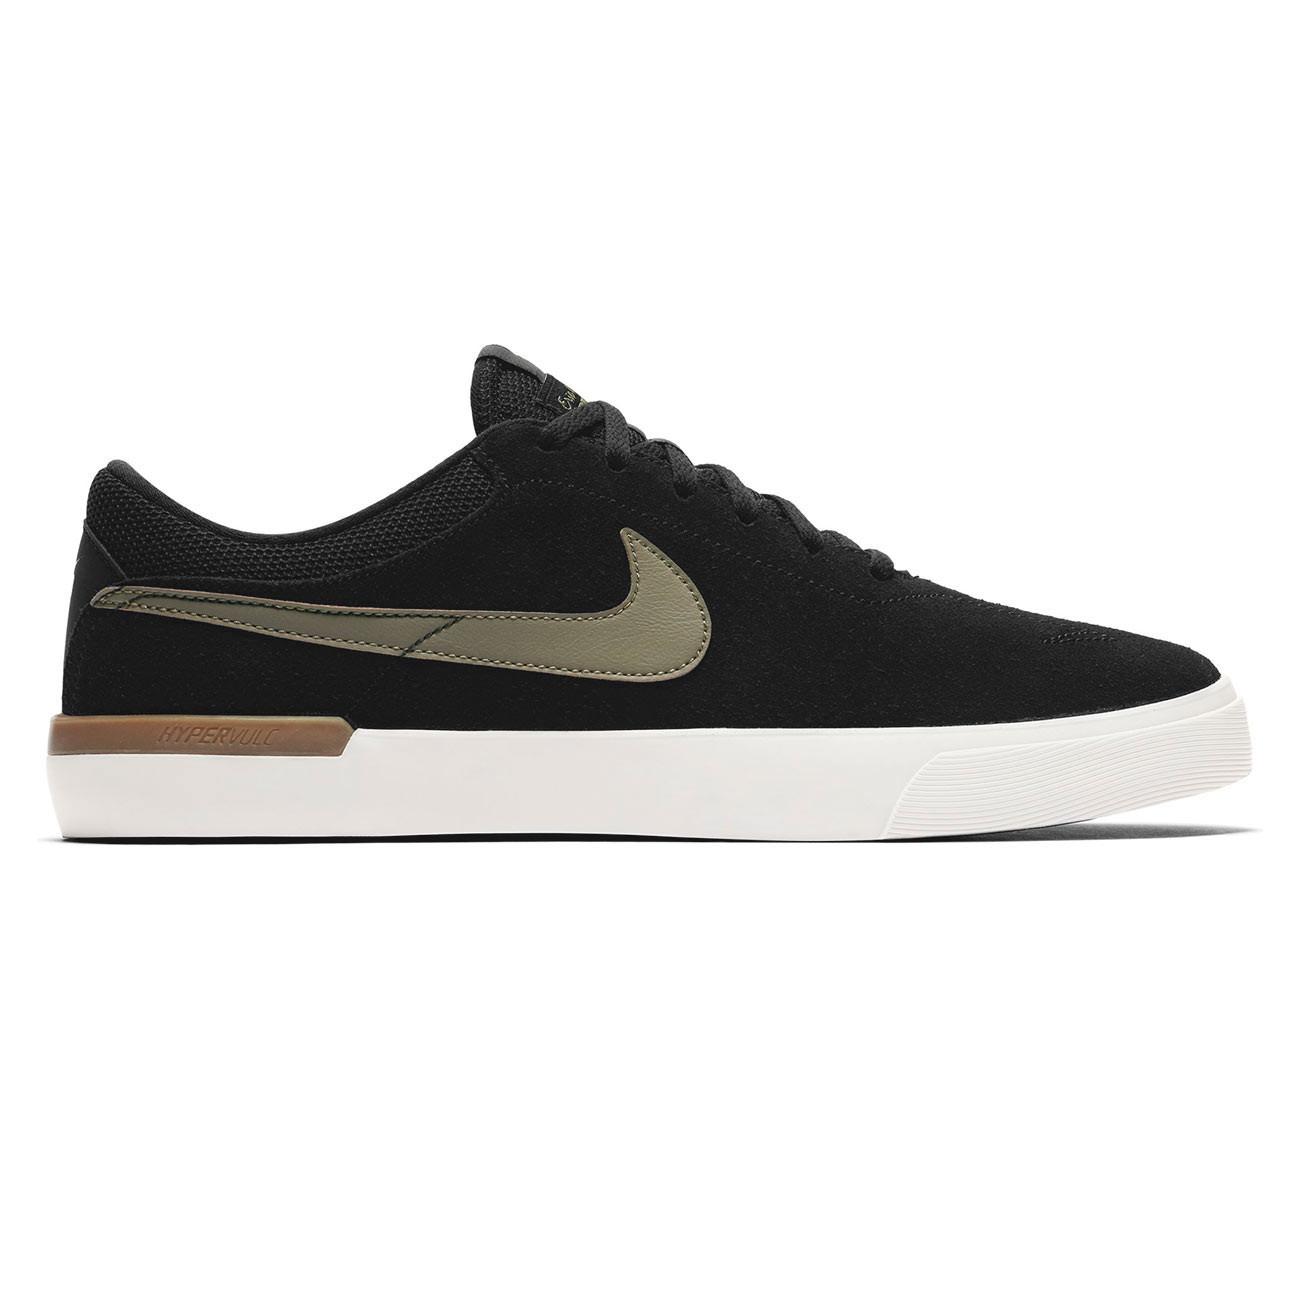 Tenisky Nike SB Hypervulc Eric Koston black/medium olive-gum med brown